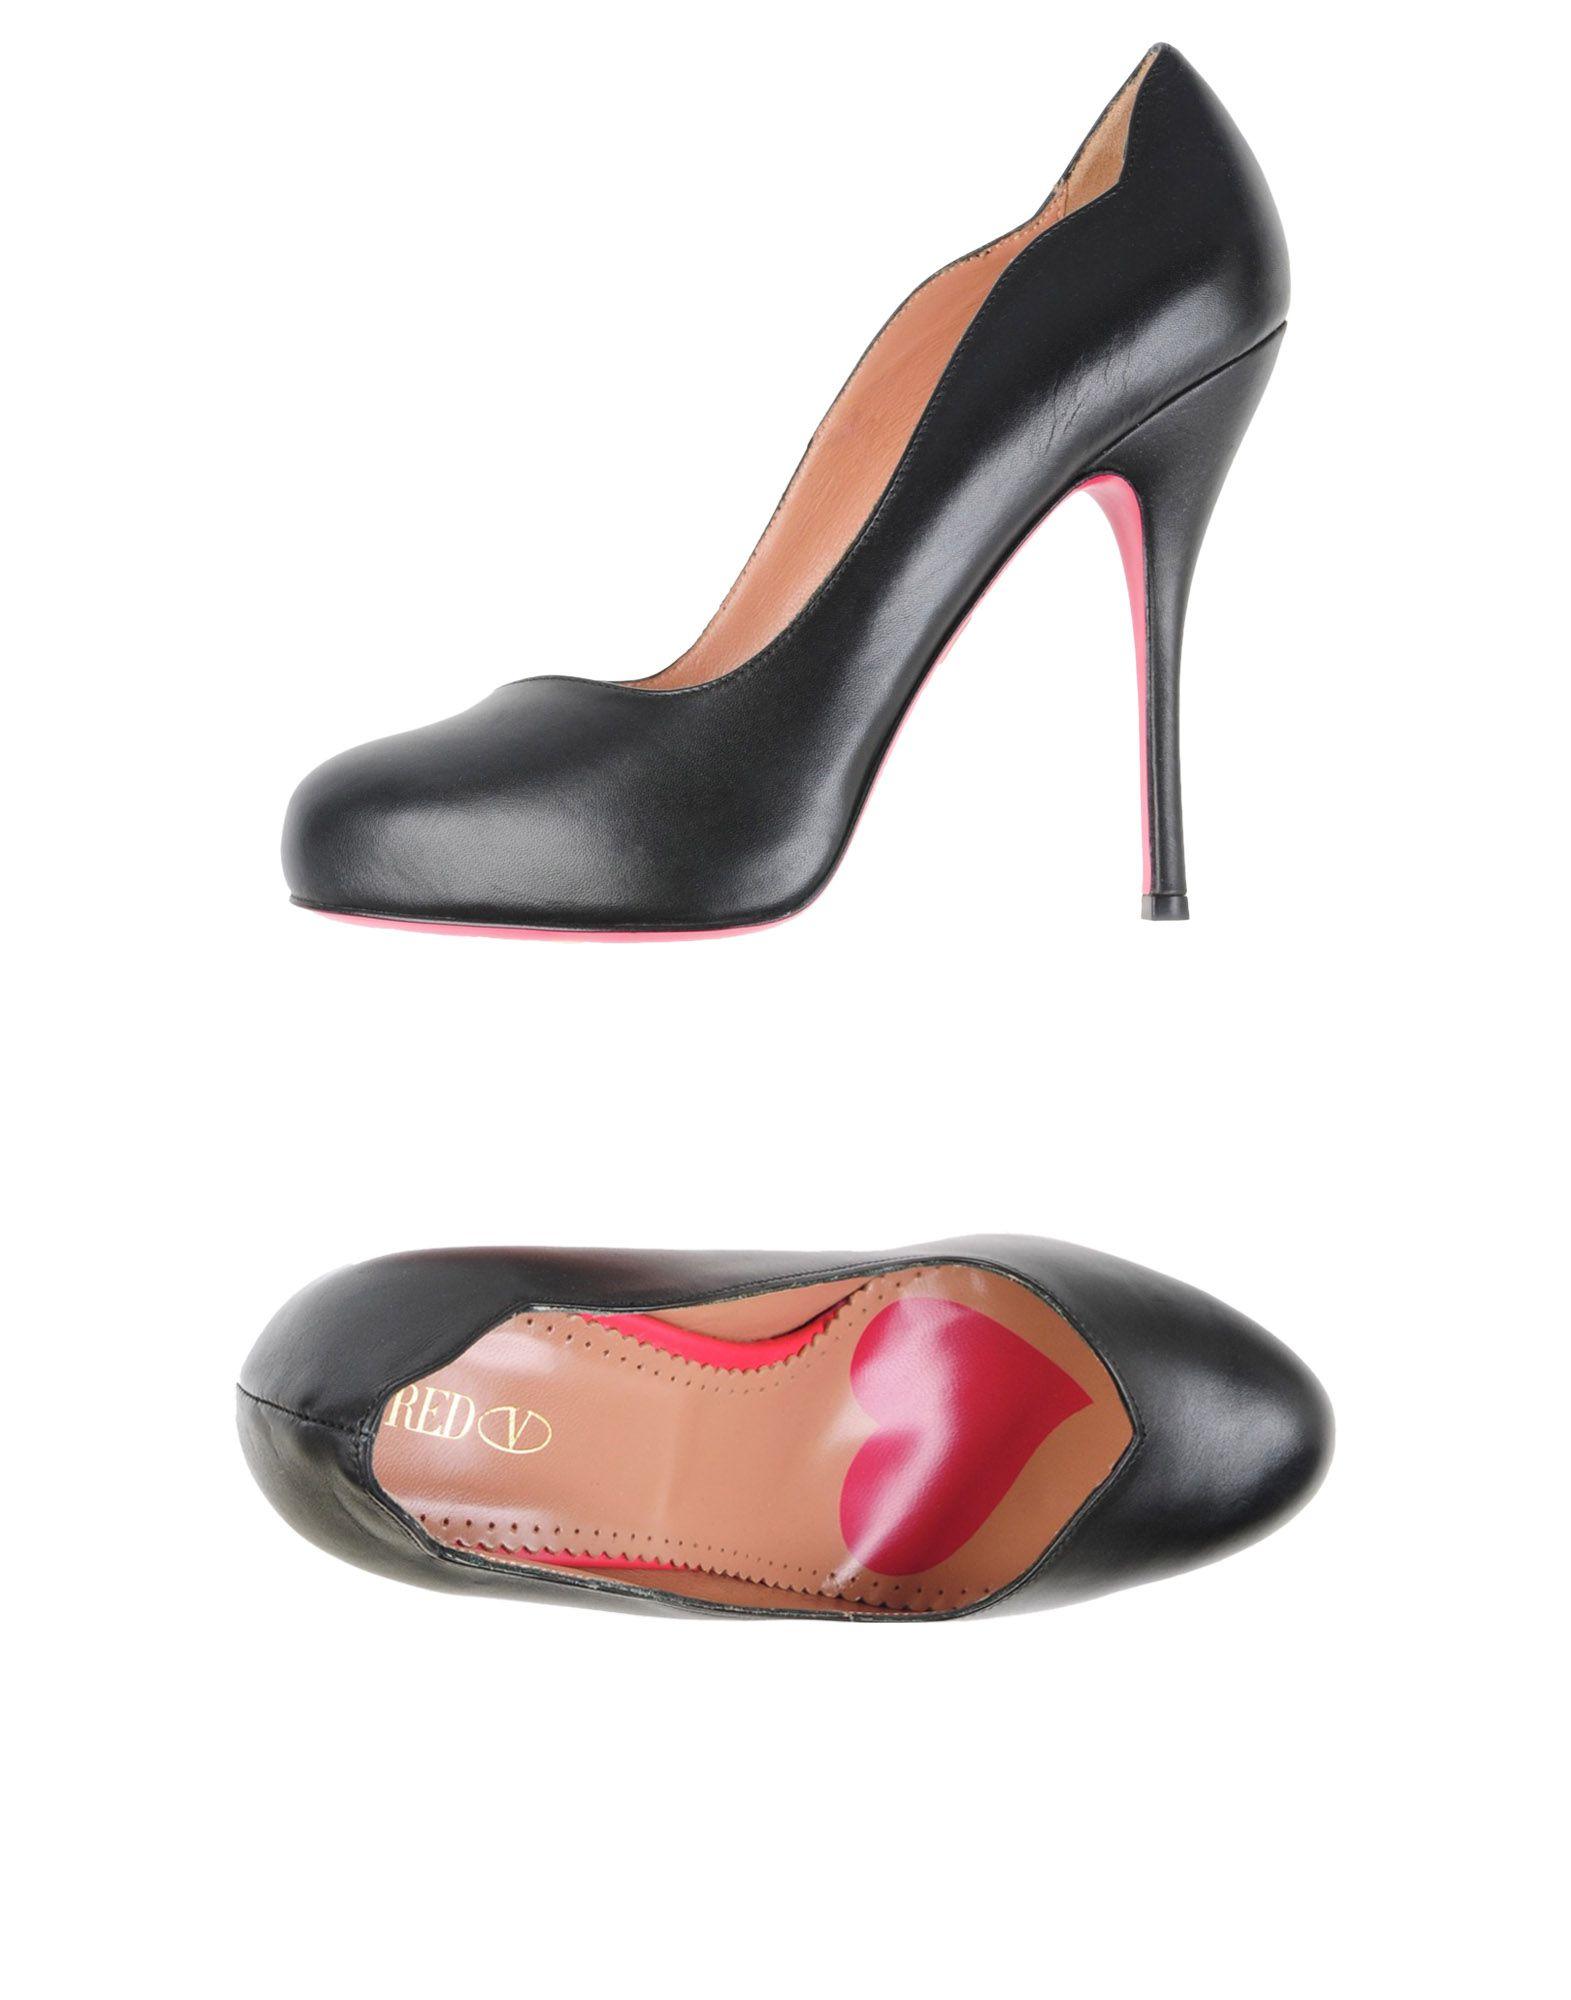 Rabatt Schuhe Red(V) Pumps Damen  11223021JG